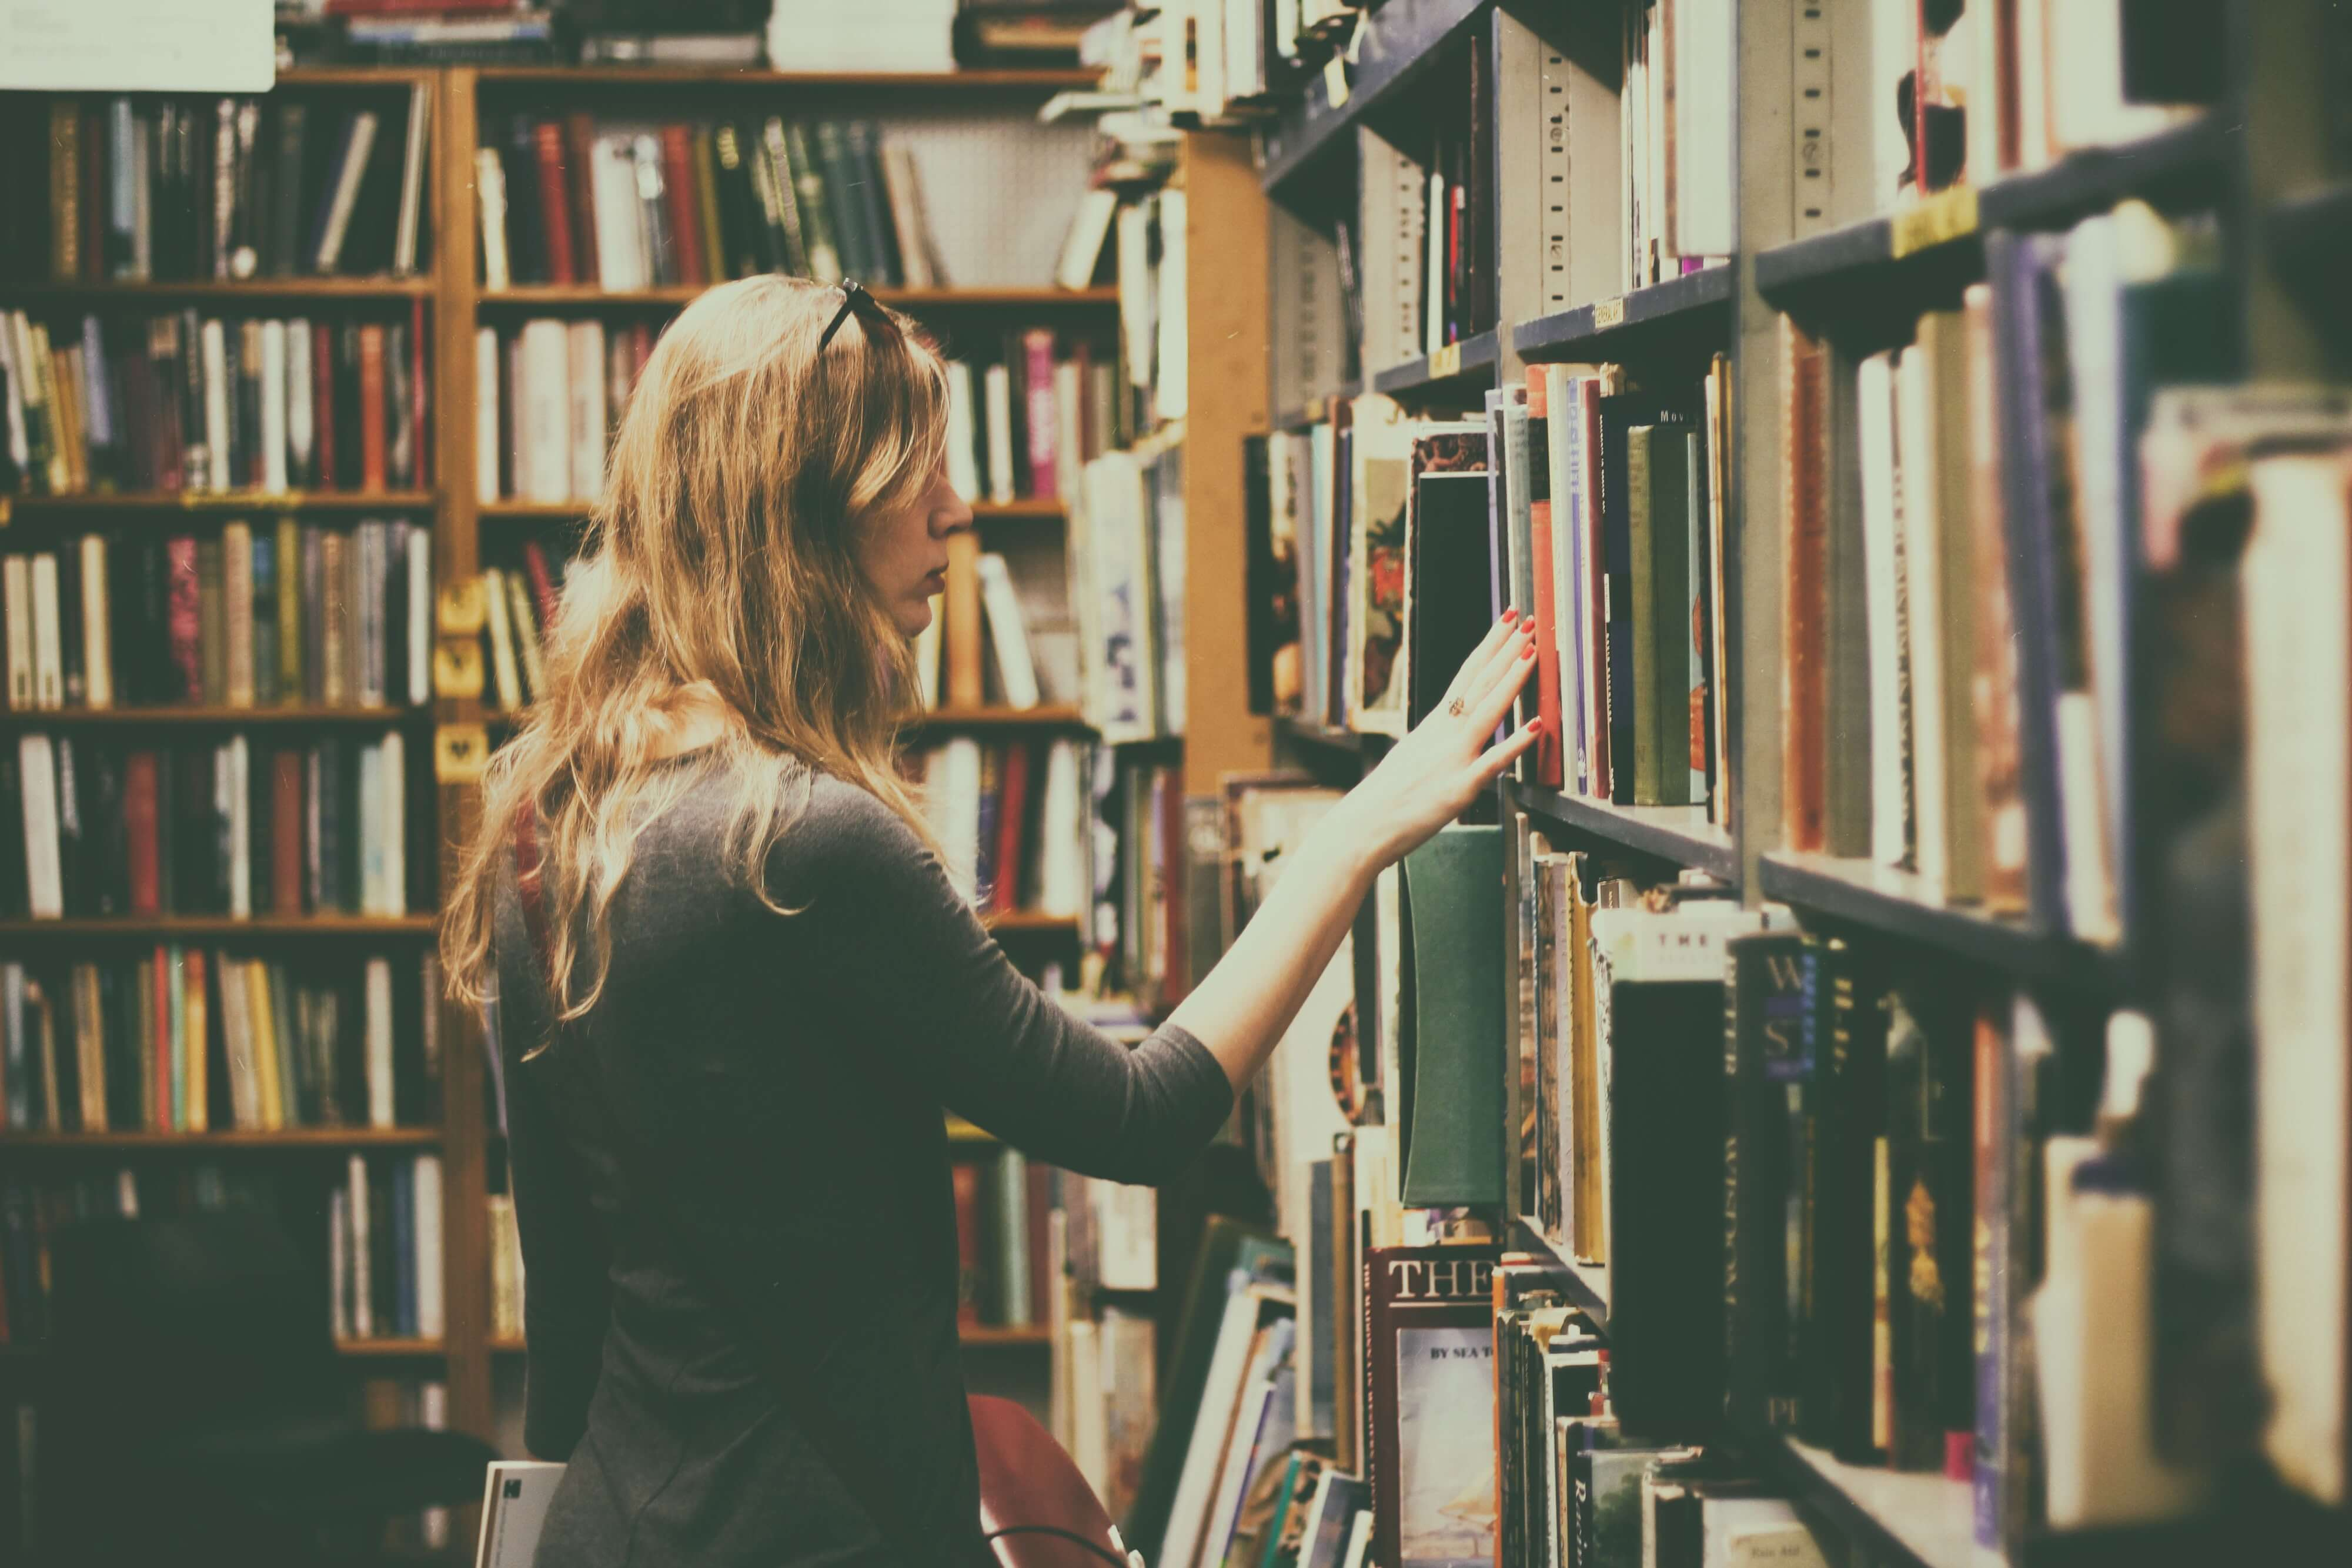 book shelves bookcase books 926680 1